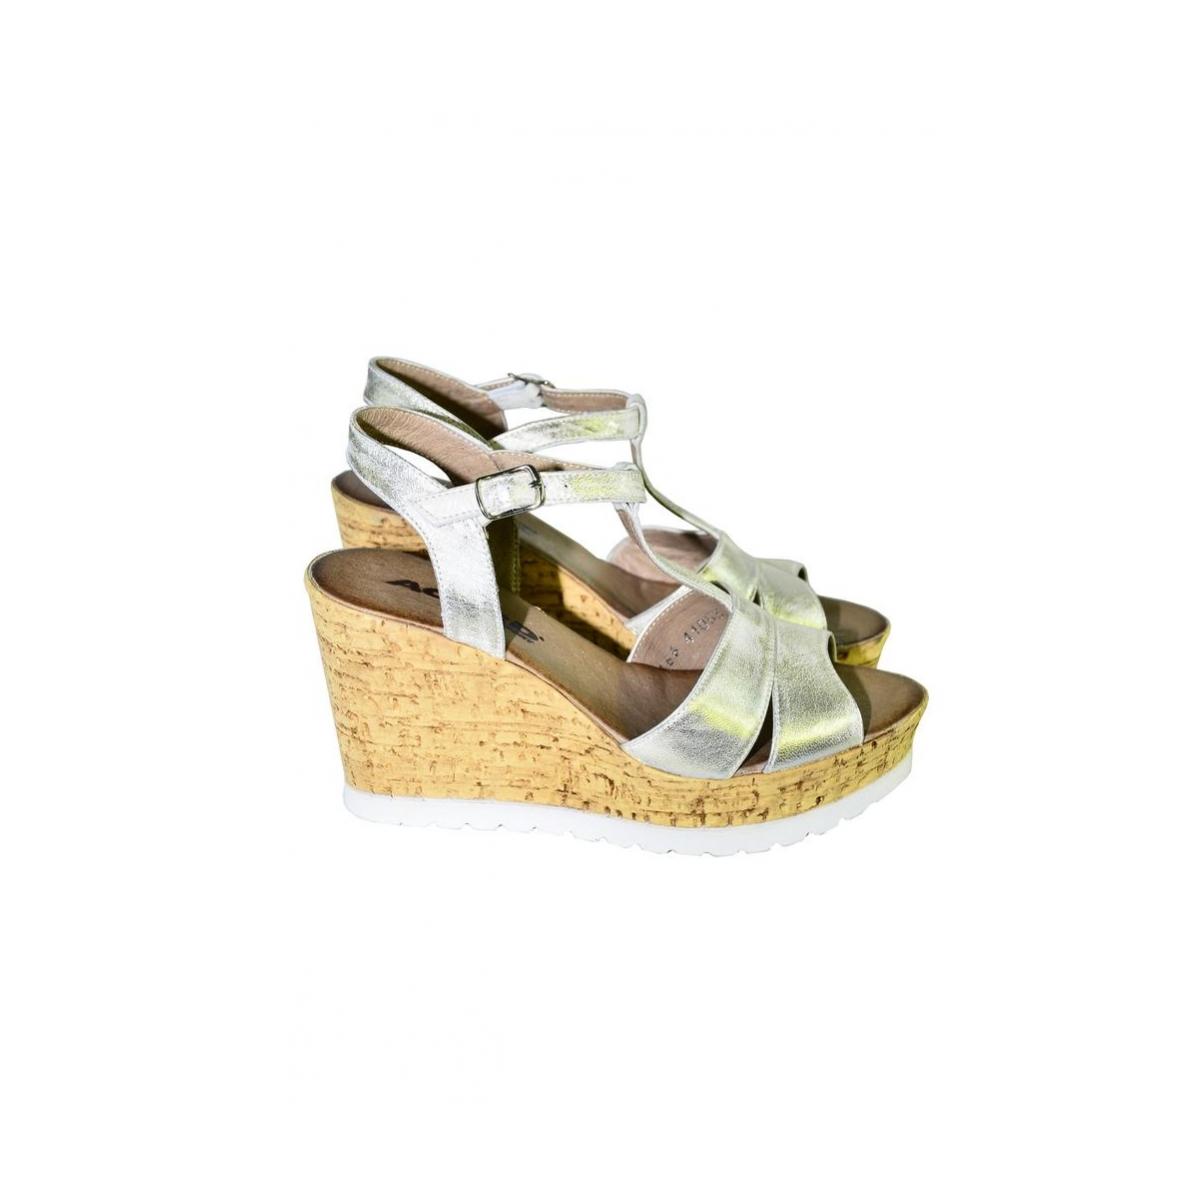 ee633842bc87 Dámske zlaté letné sandále JENSE - 2